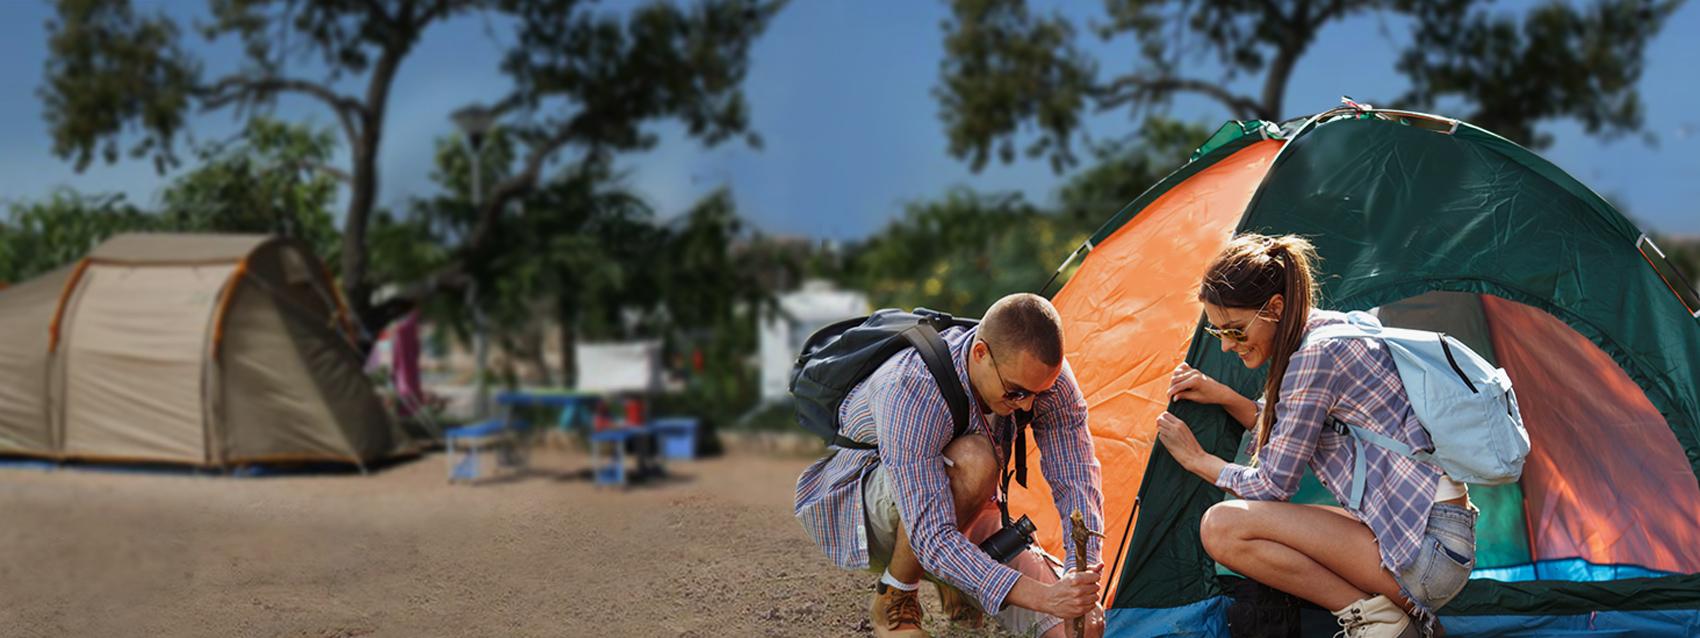 Lotes individuais para tendas perfeitamente equipadas para tendas - Camping Ria Formosa no Algarve